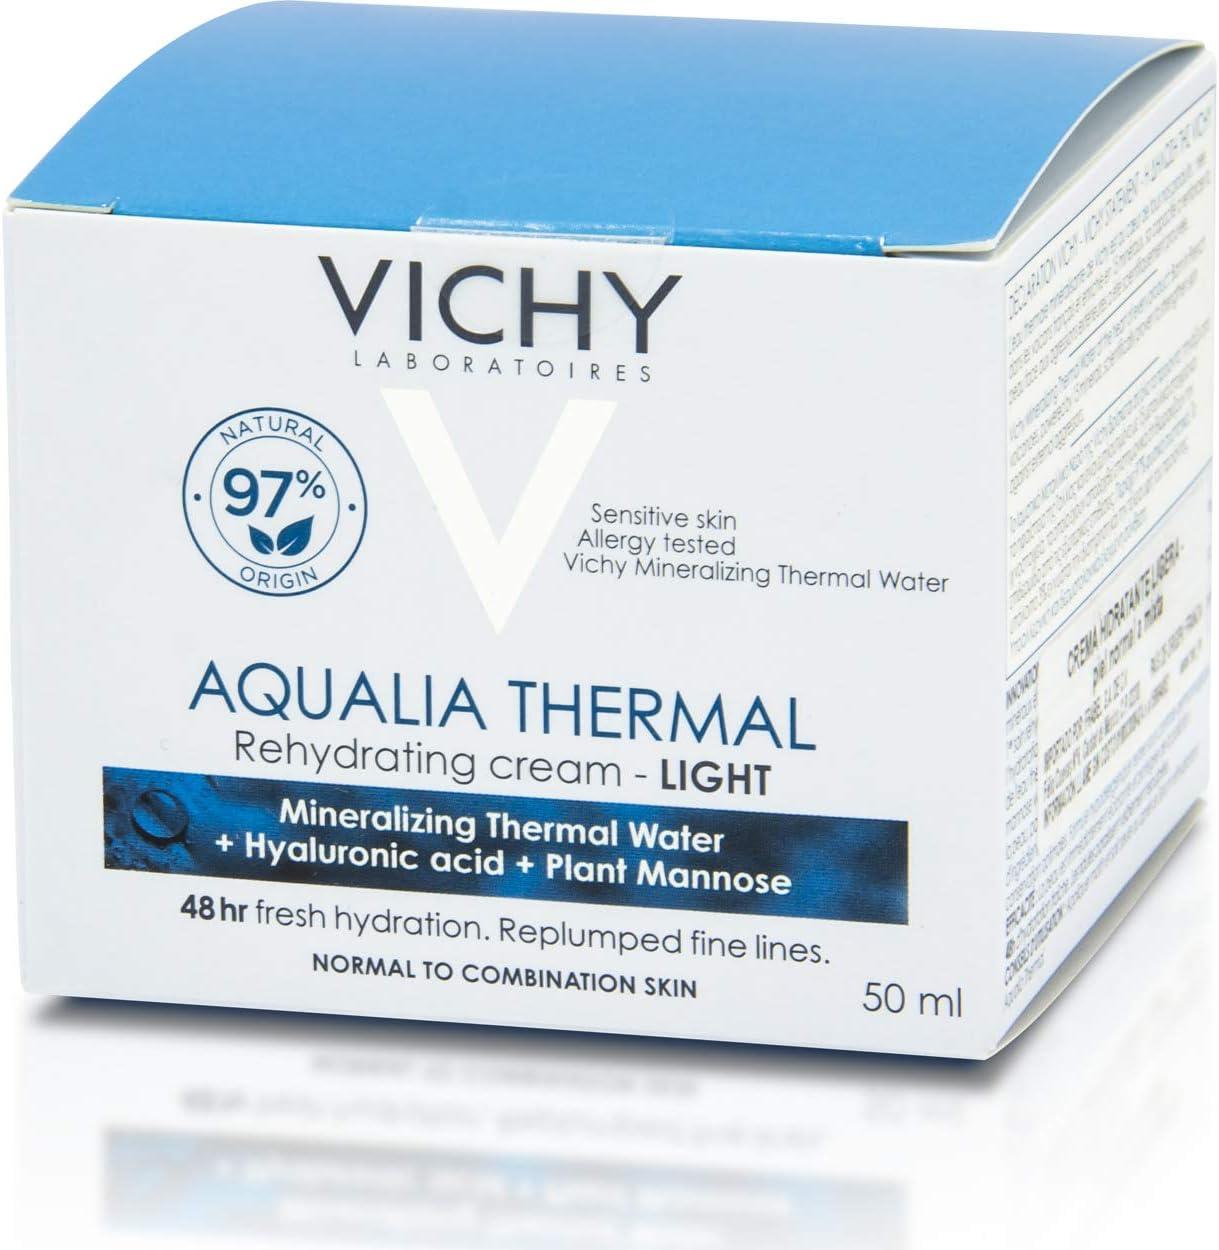 Vichy Aqualia Thermal Crème Réhydratante Légère 50 Ml 1 Unidad 1200 g